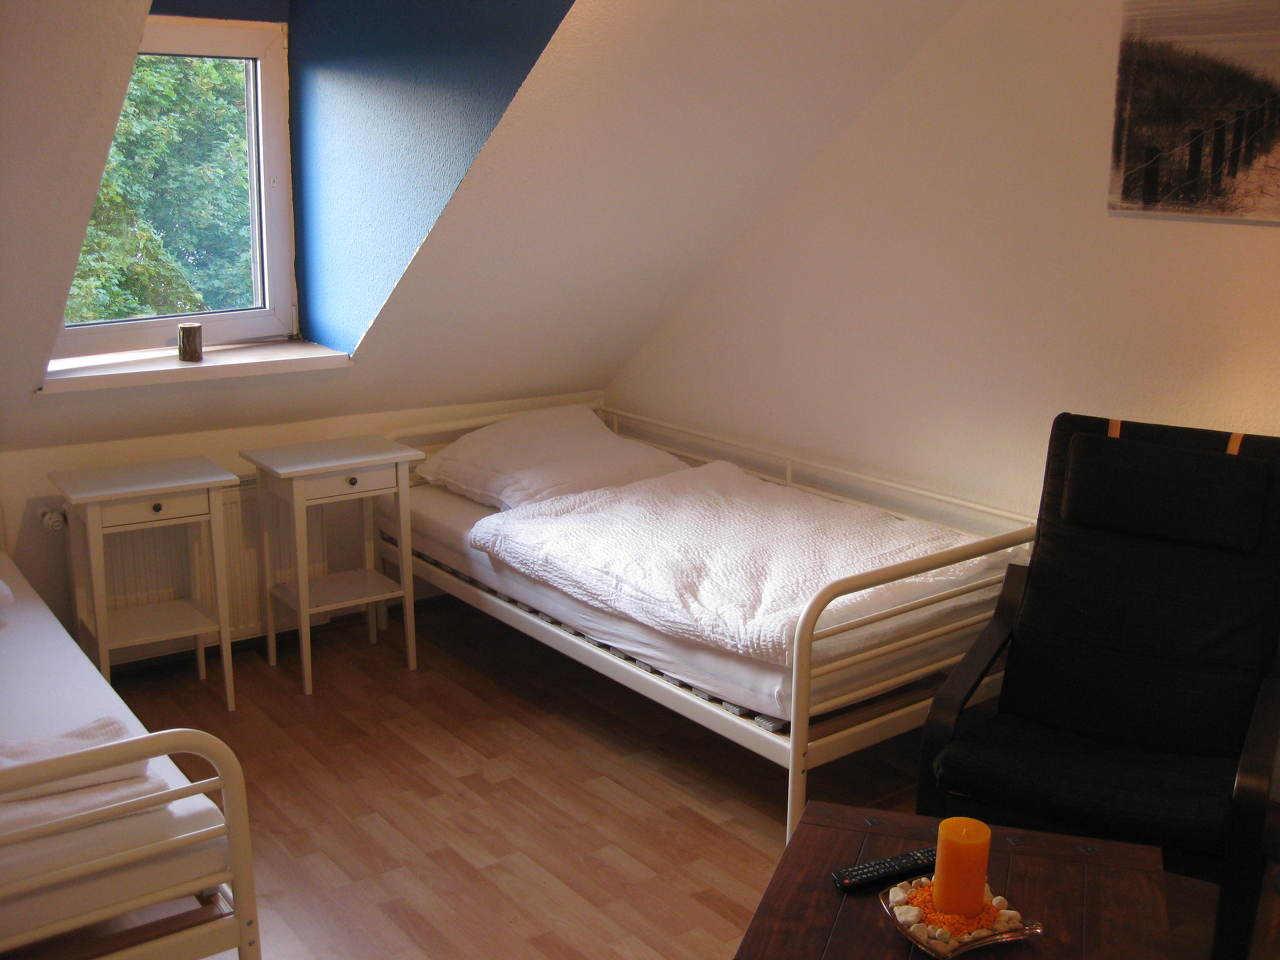 Schlafzimmer Ferienwohnung Pension Falke Dortmund Dachgeschoss